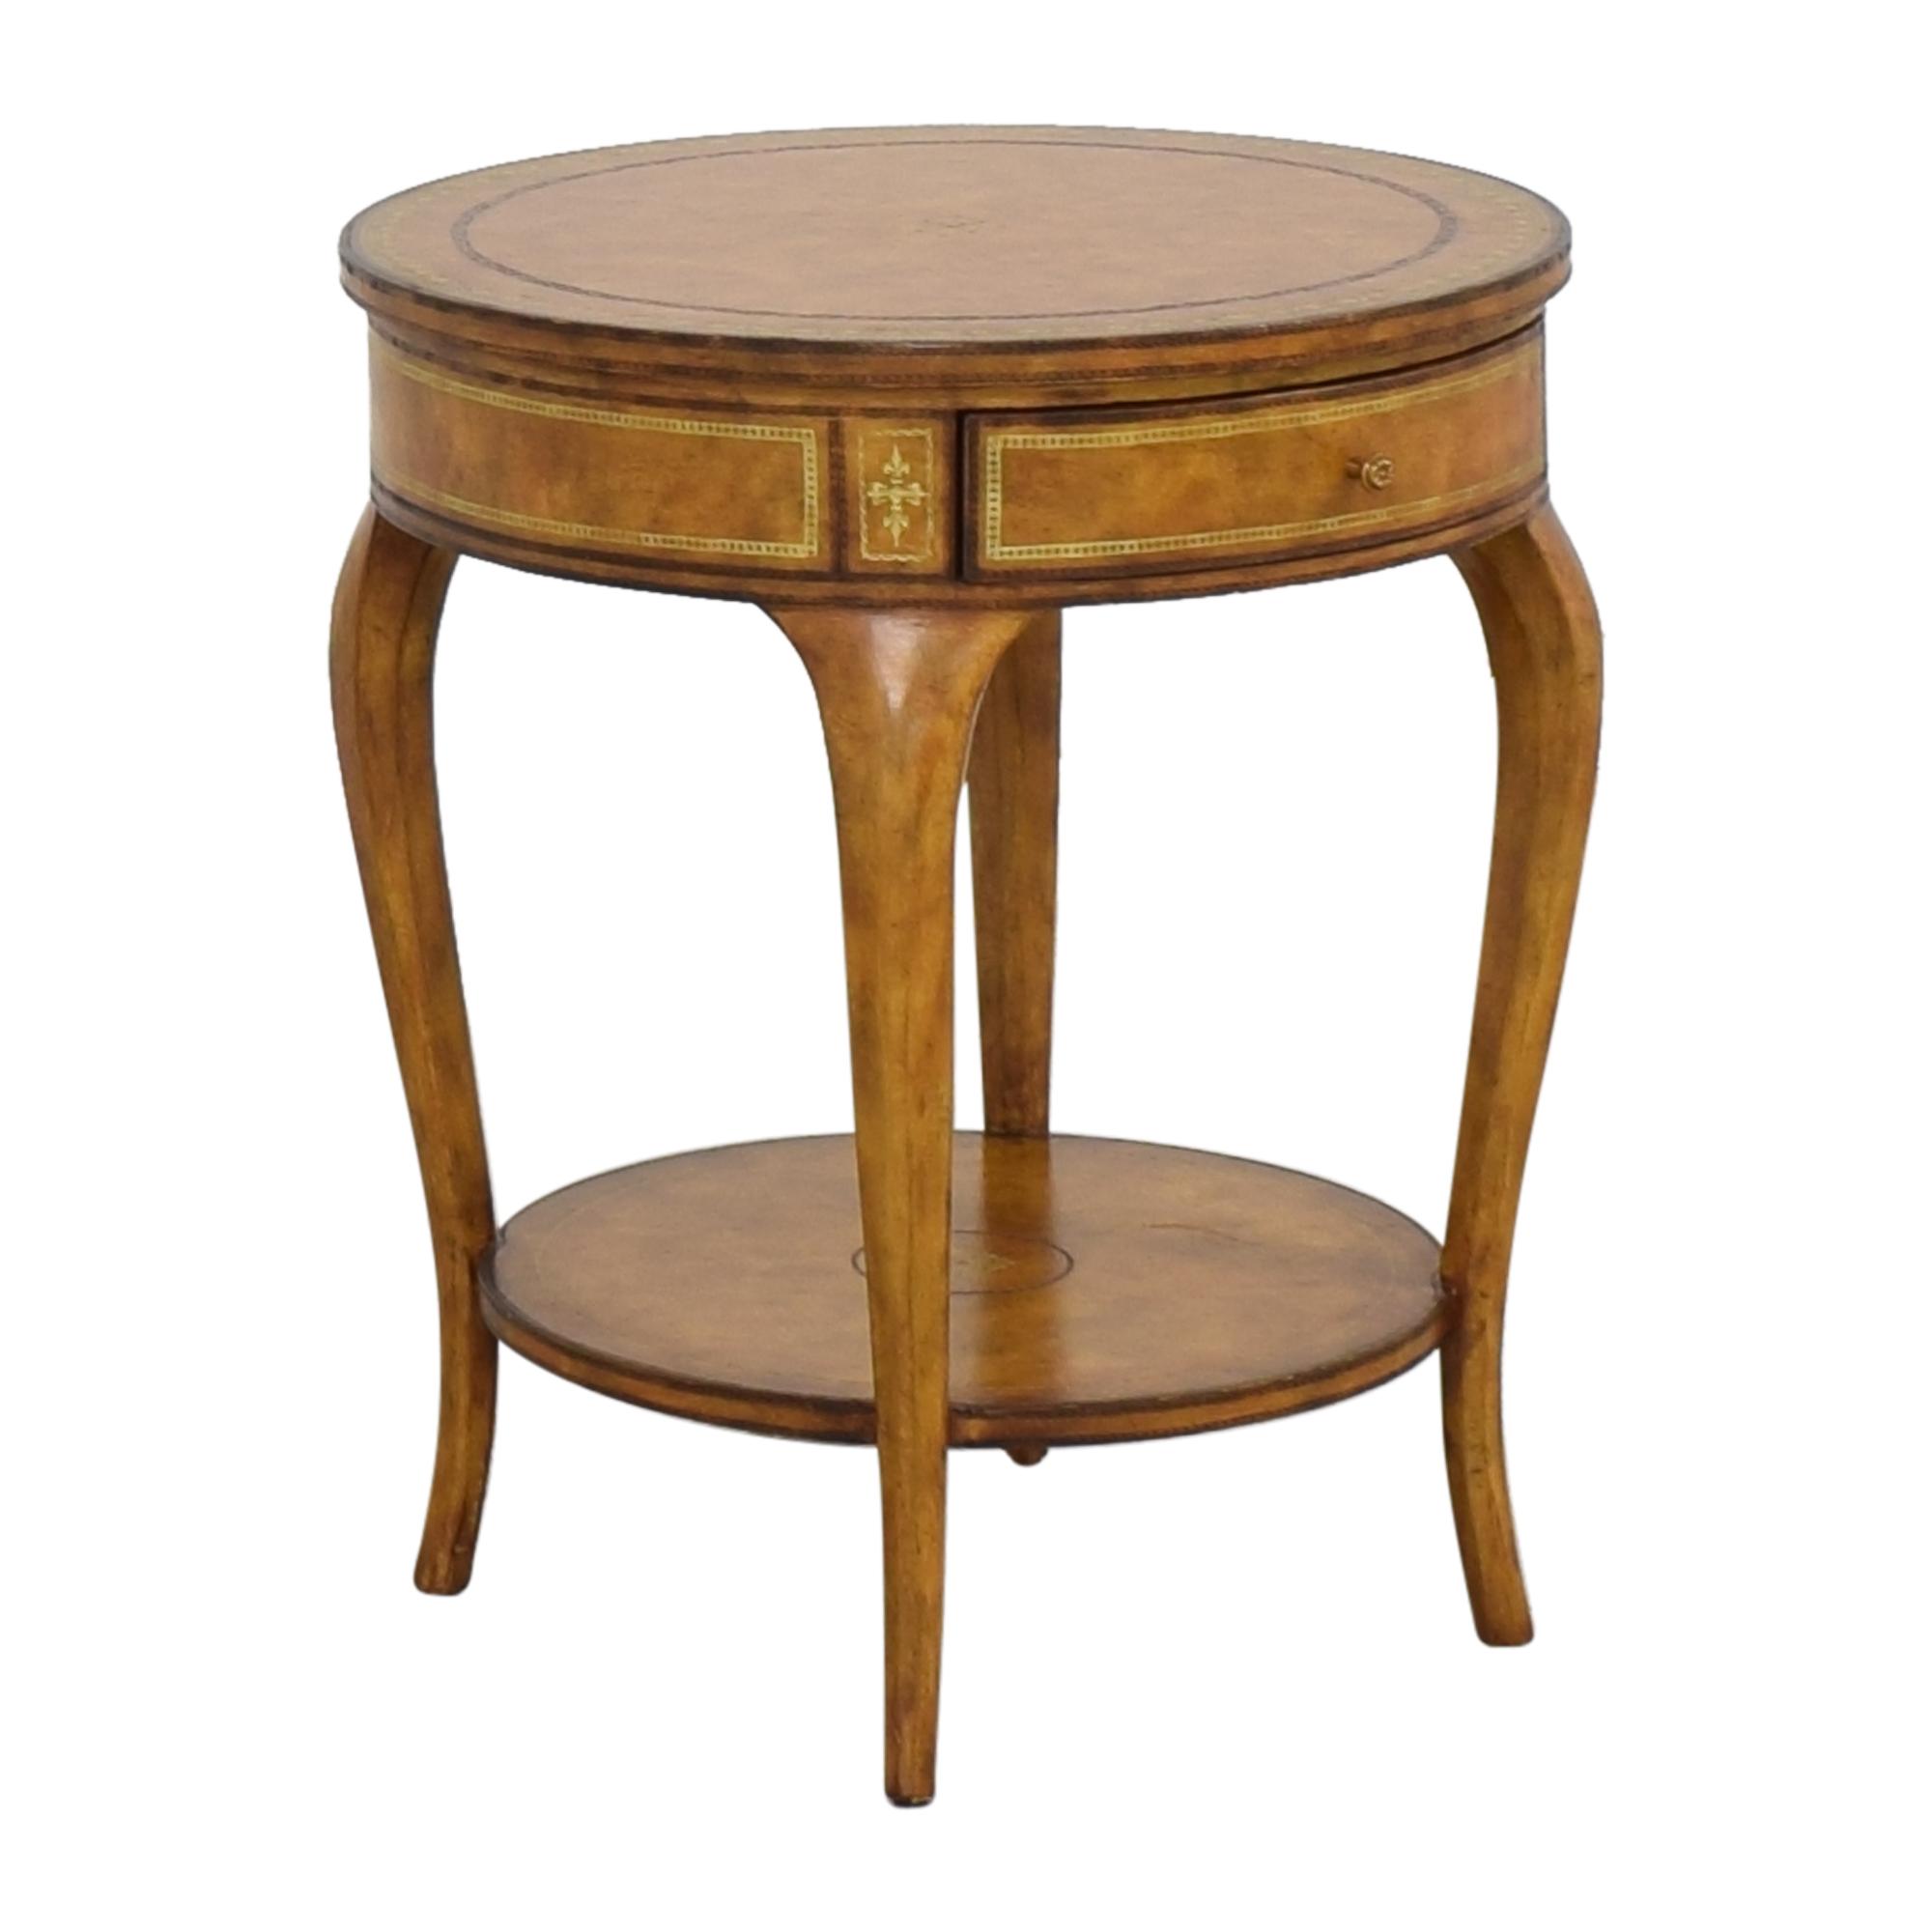 Maitland-Smith Maitland-Smith Round Accent Table Tables